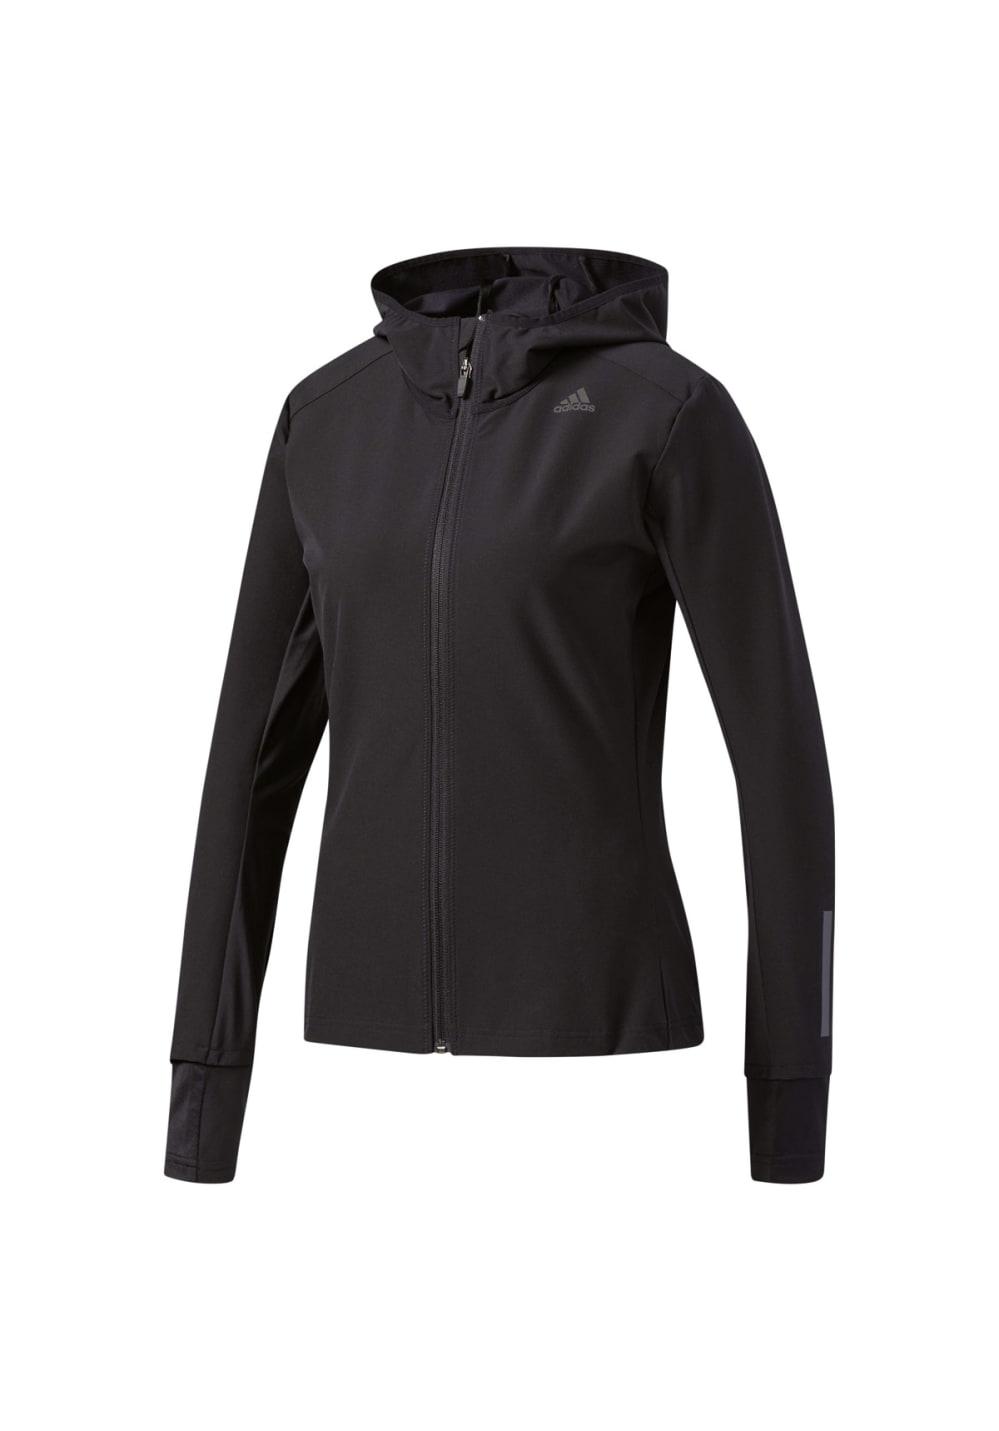 Response Course Femme Noir Pour Shell Jacket Soft Vestes Adidas Ybyvf76g